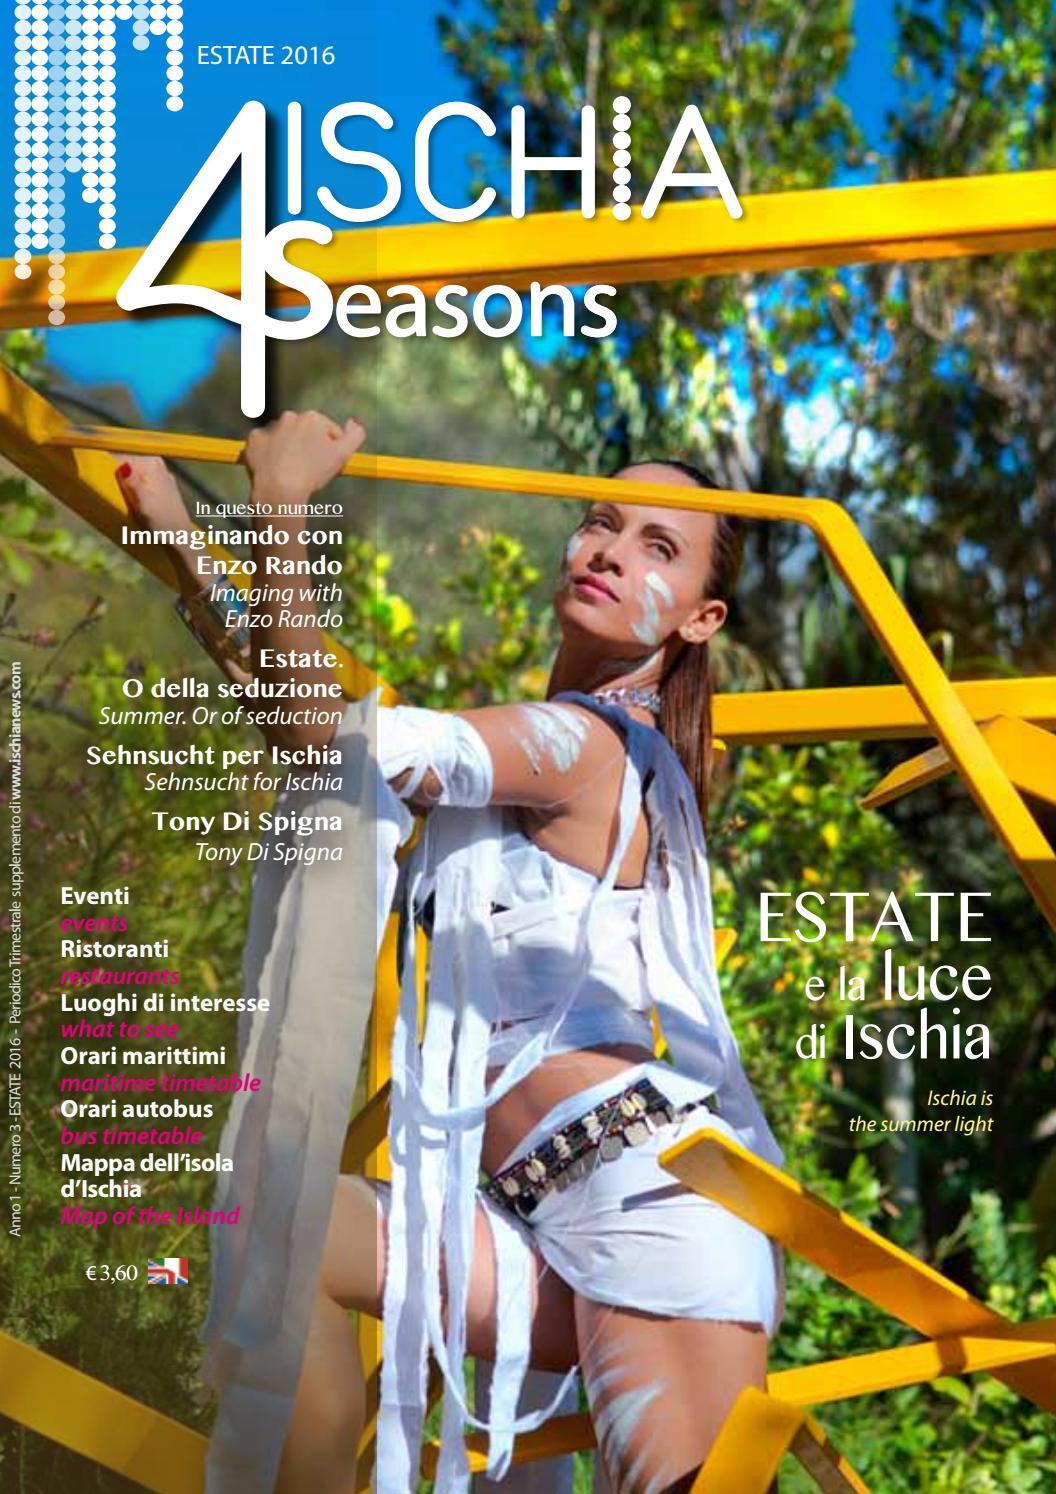 Ischia Seasons 4 Seasons Ischia Estate 2016 La luce di Ischia by Ischia News issuu 1af1f5